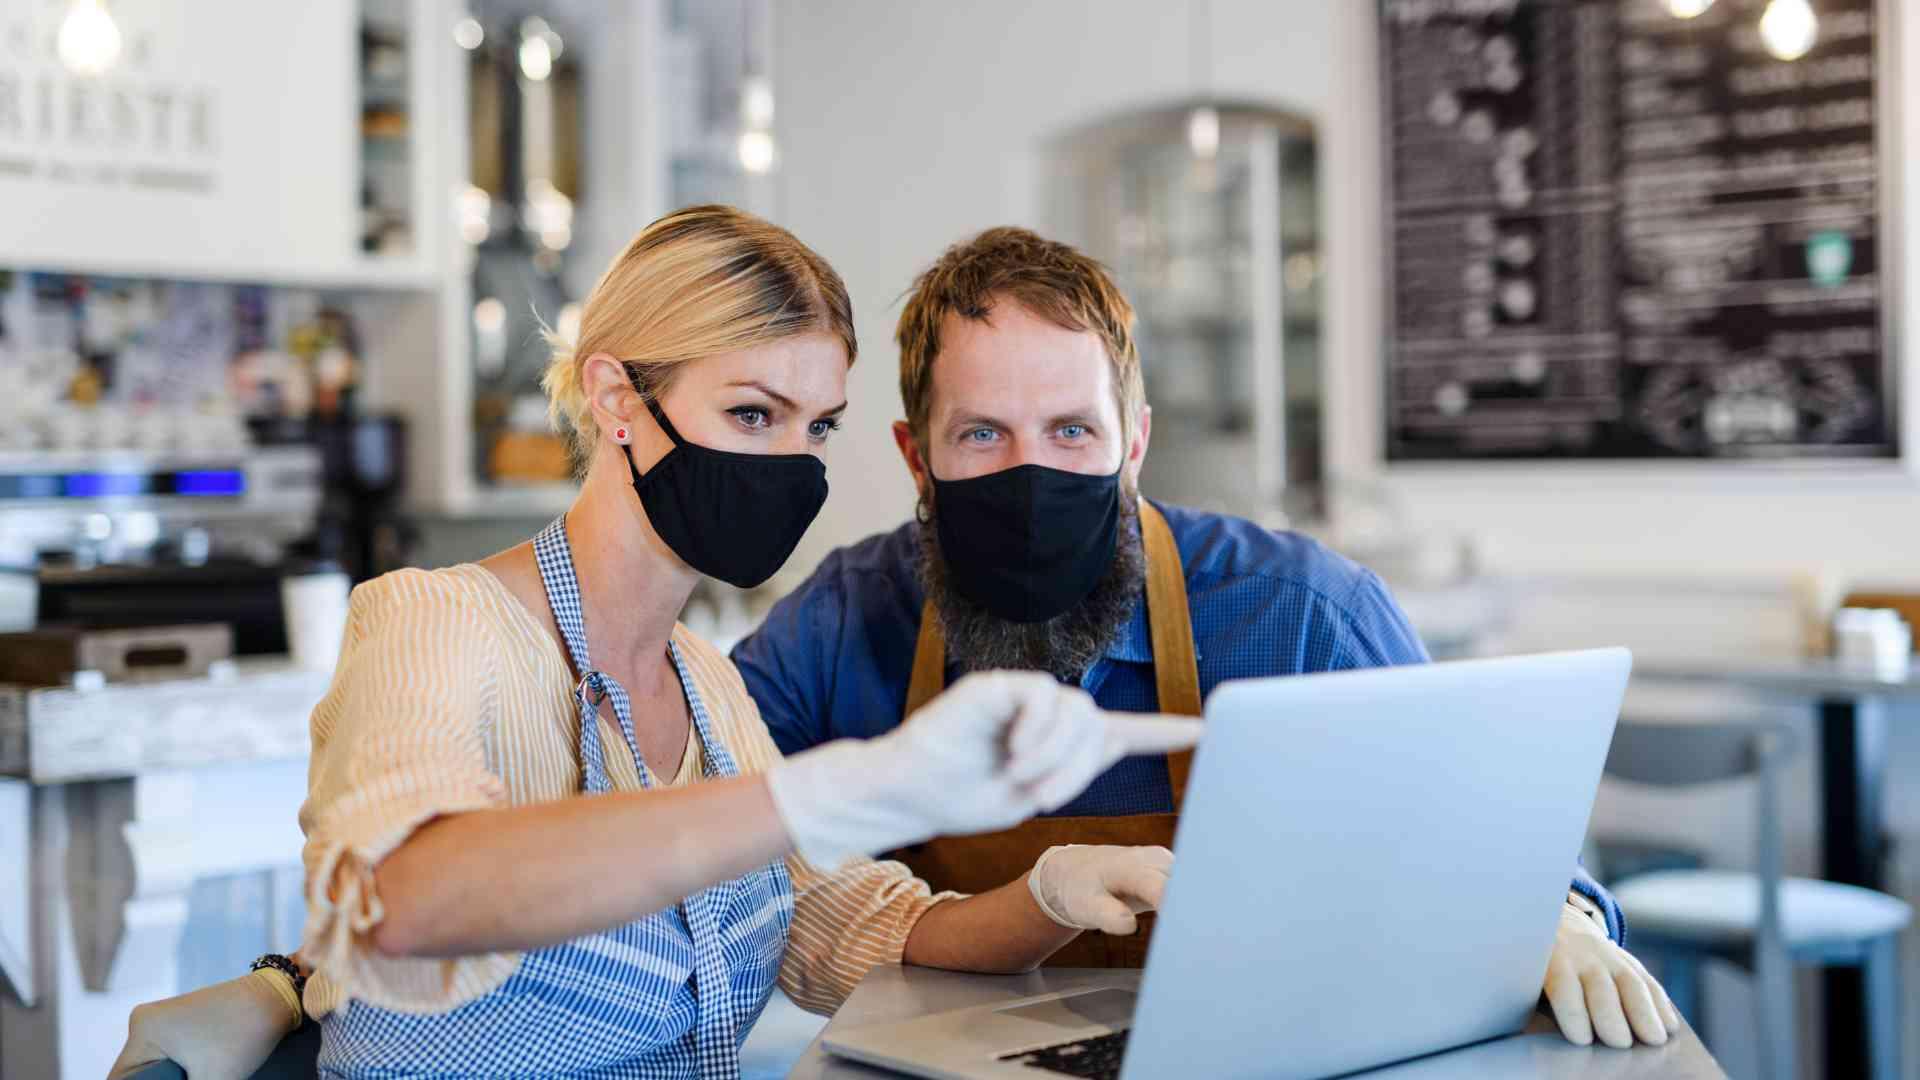 Coffee Shop Owner Retailer Coronavirus Pandemic